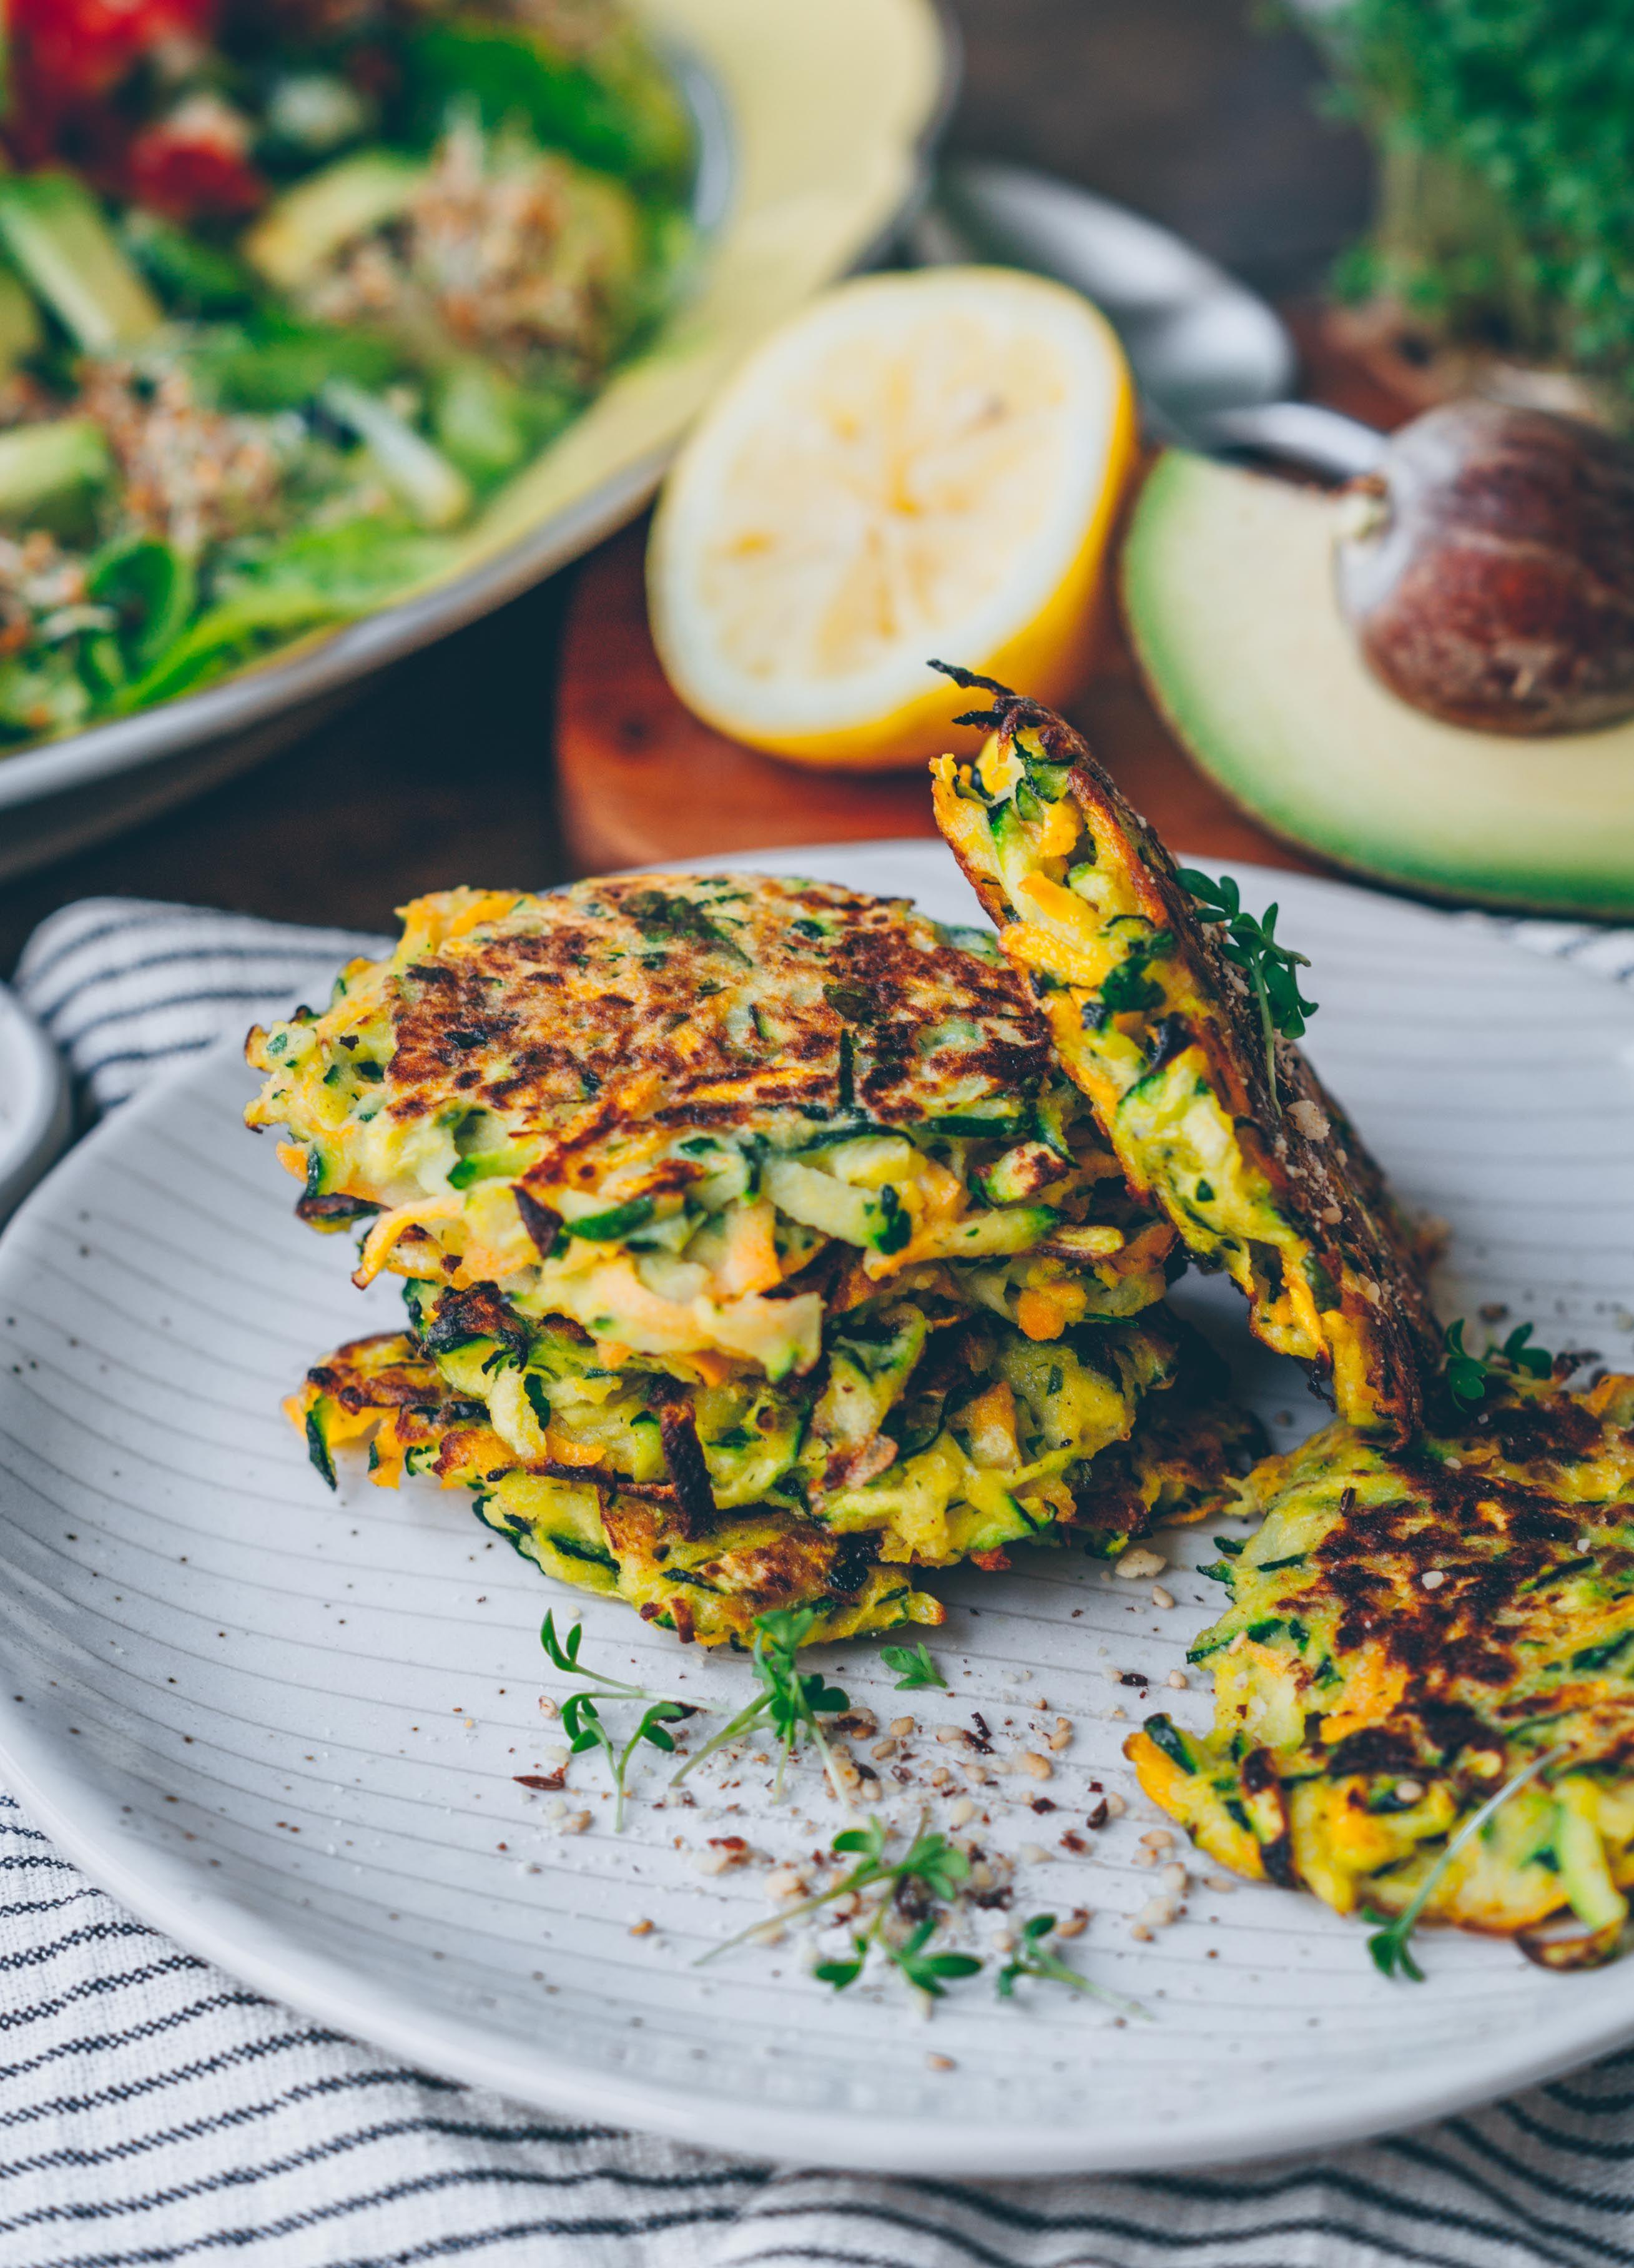 Karotten Zucchini Puffer Vegan Gf Klara S Life Zucchini In